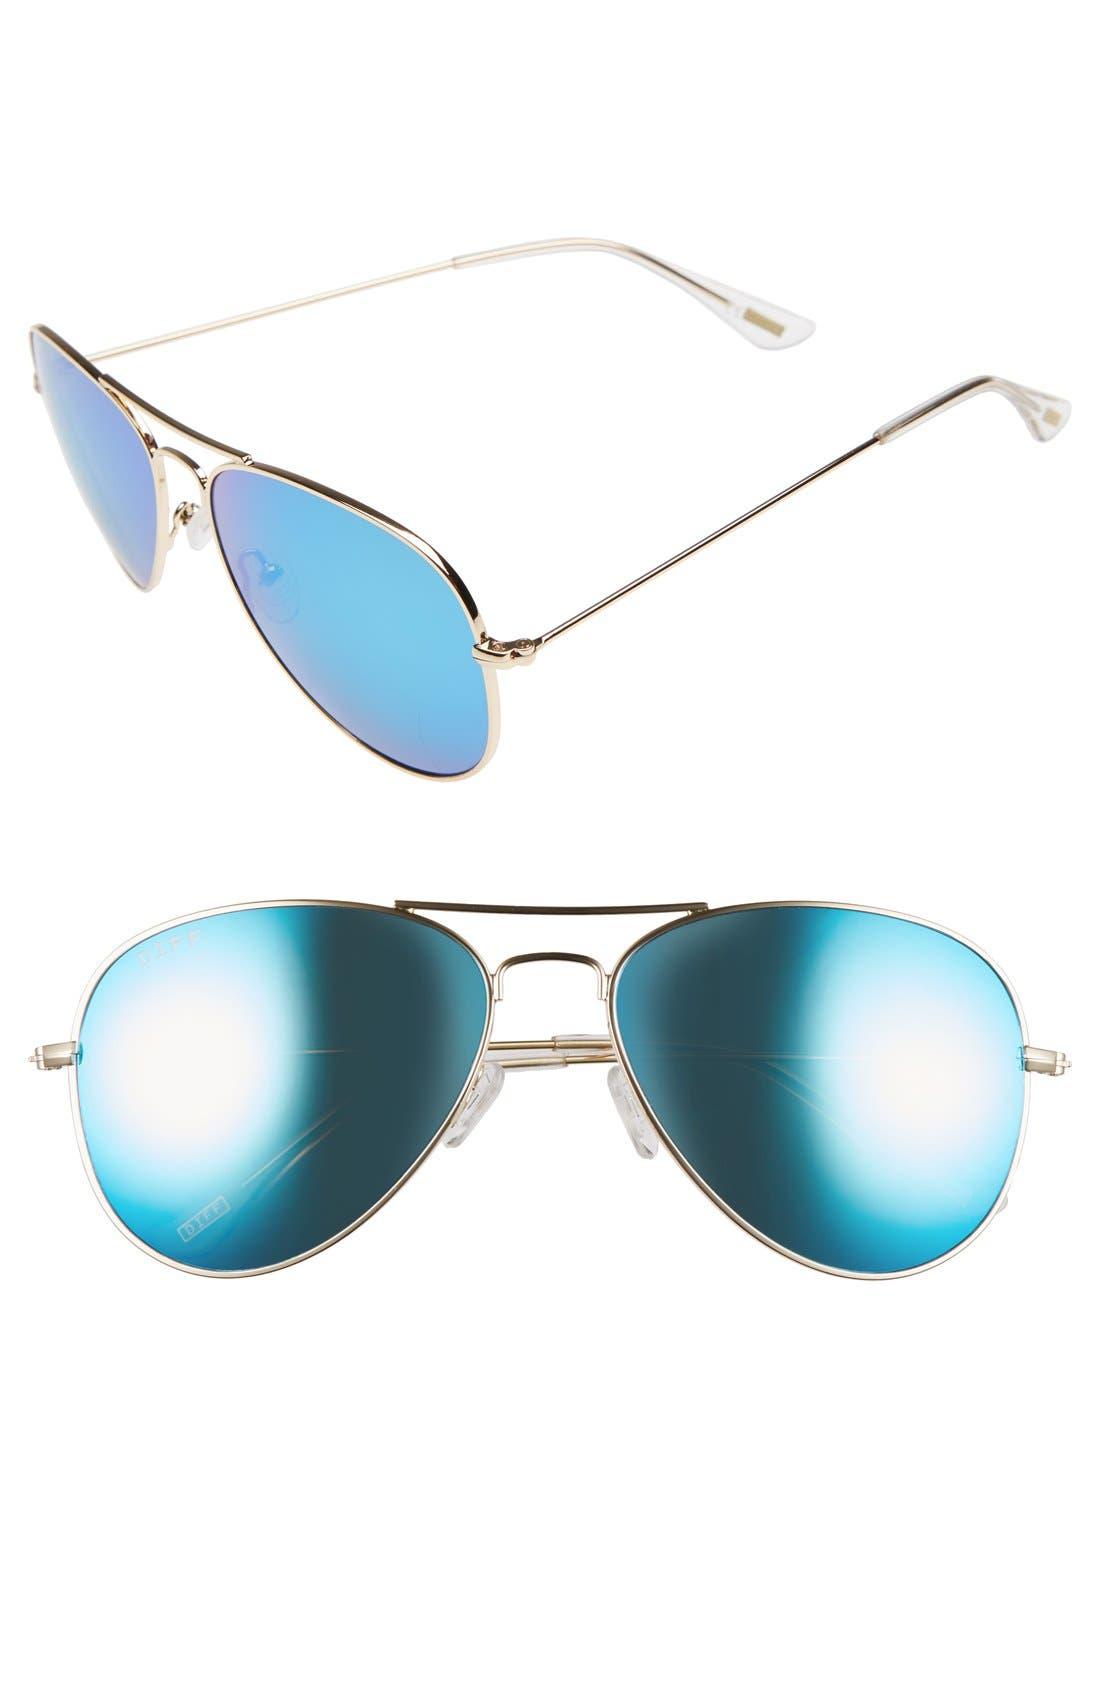 Main Image - DIFF Cruz 57mm Metal Aviator Sunglasses